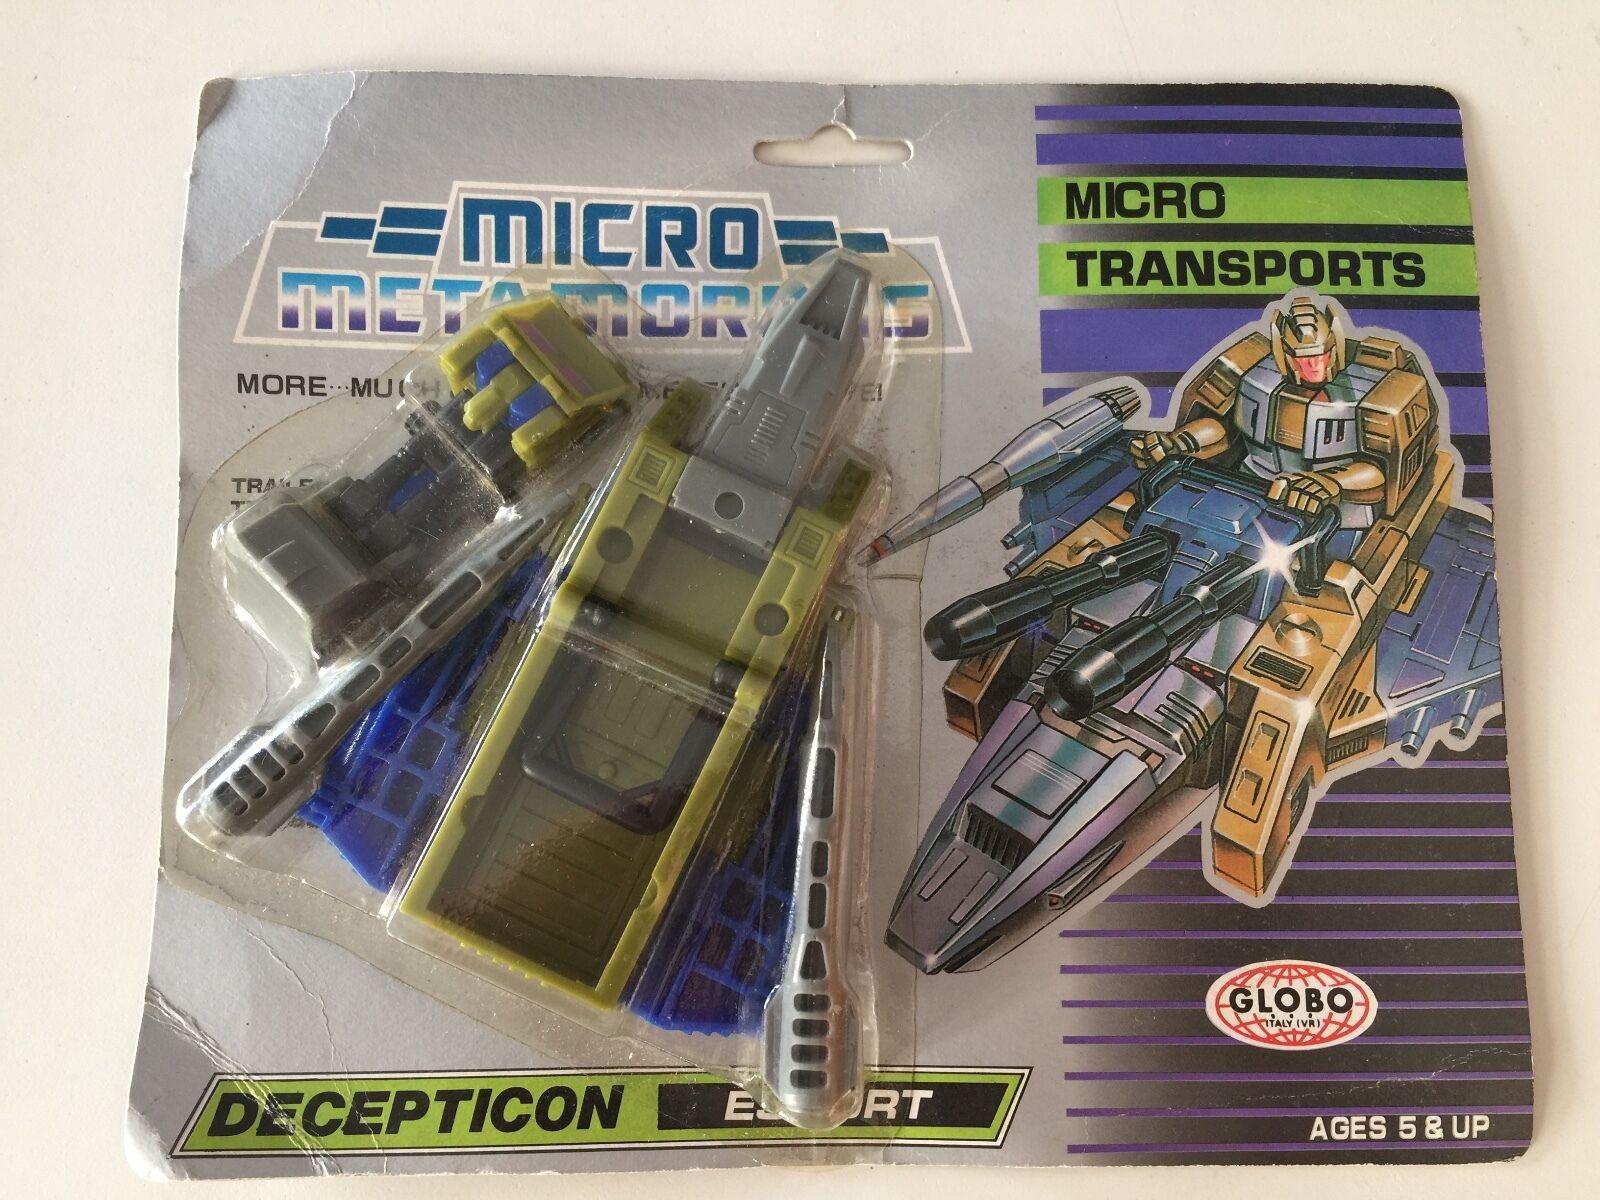 METAMORPHS transformer transport decepticon micromaster MOSC ITALY (roughstuff)